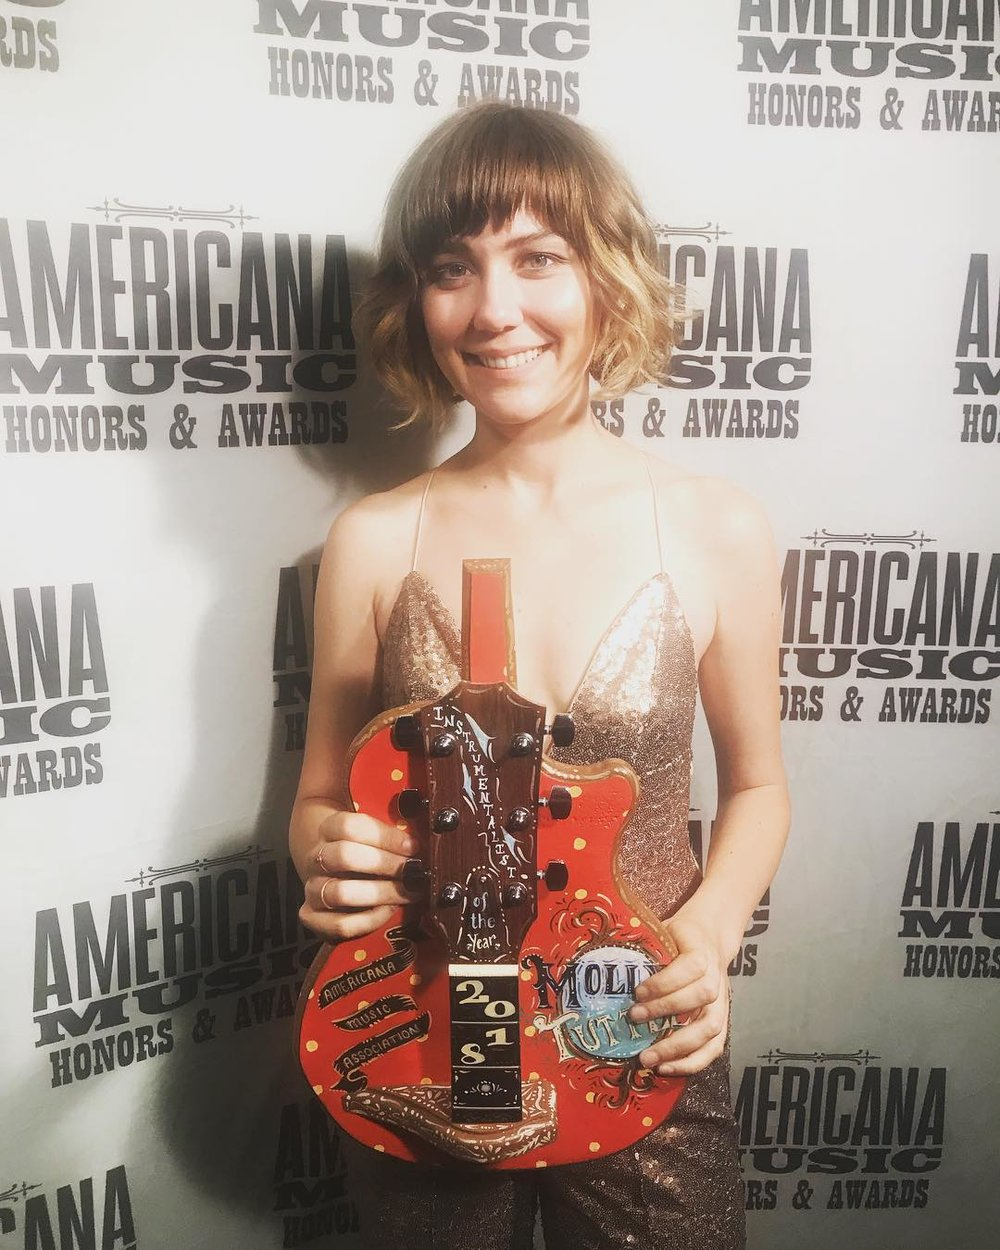 americana instrumentalist award.jpg